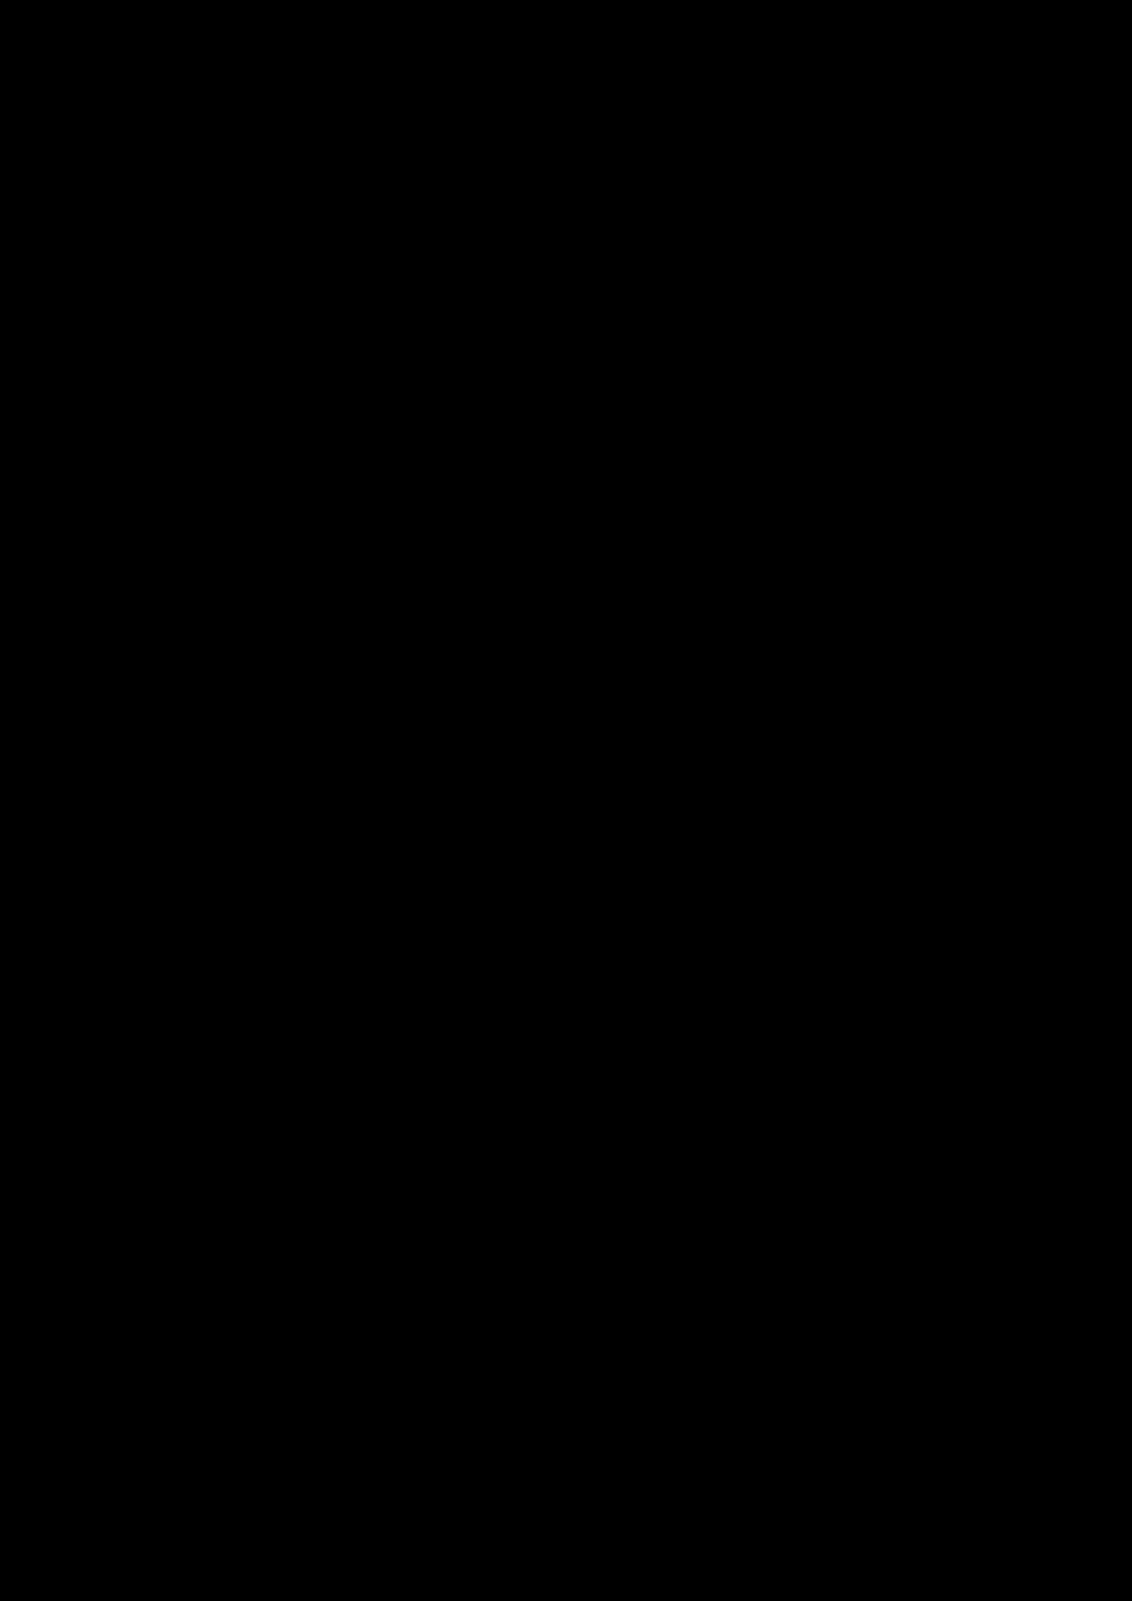 Belyiy sokol slide, Image 148